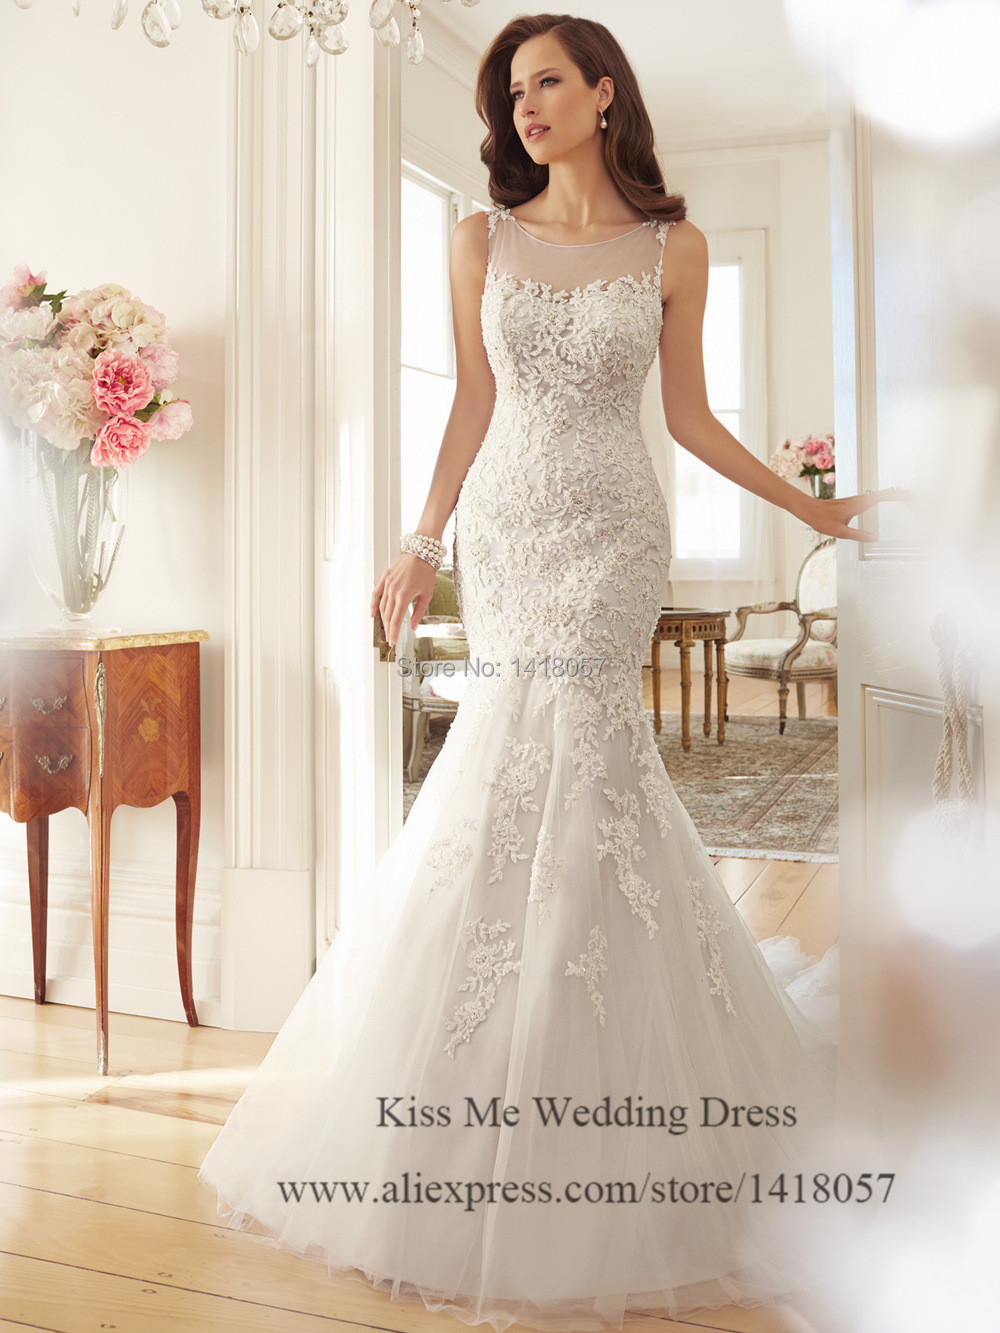 Aliexpress.com : Buy Latest Design Lace Wedding Dress 2015 Mermaid ...